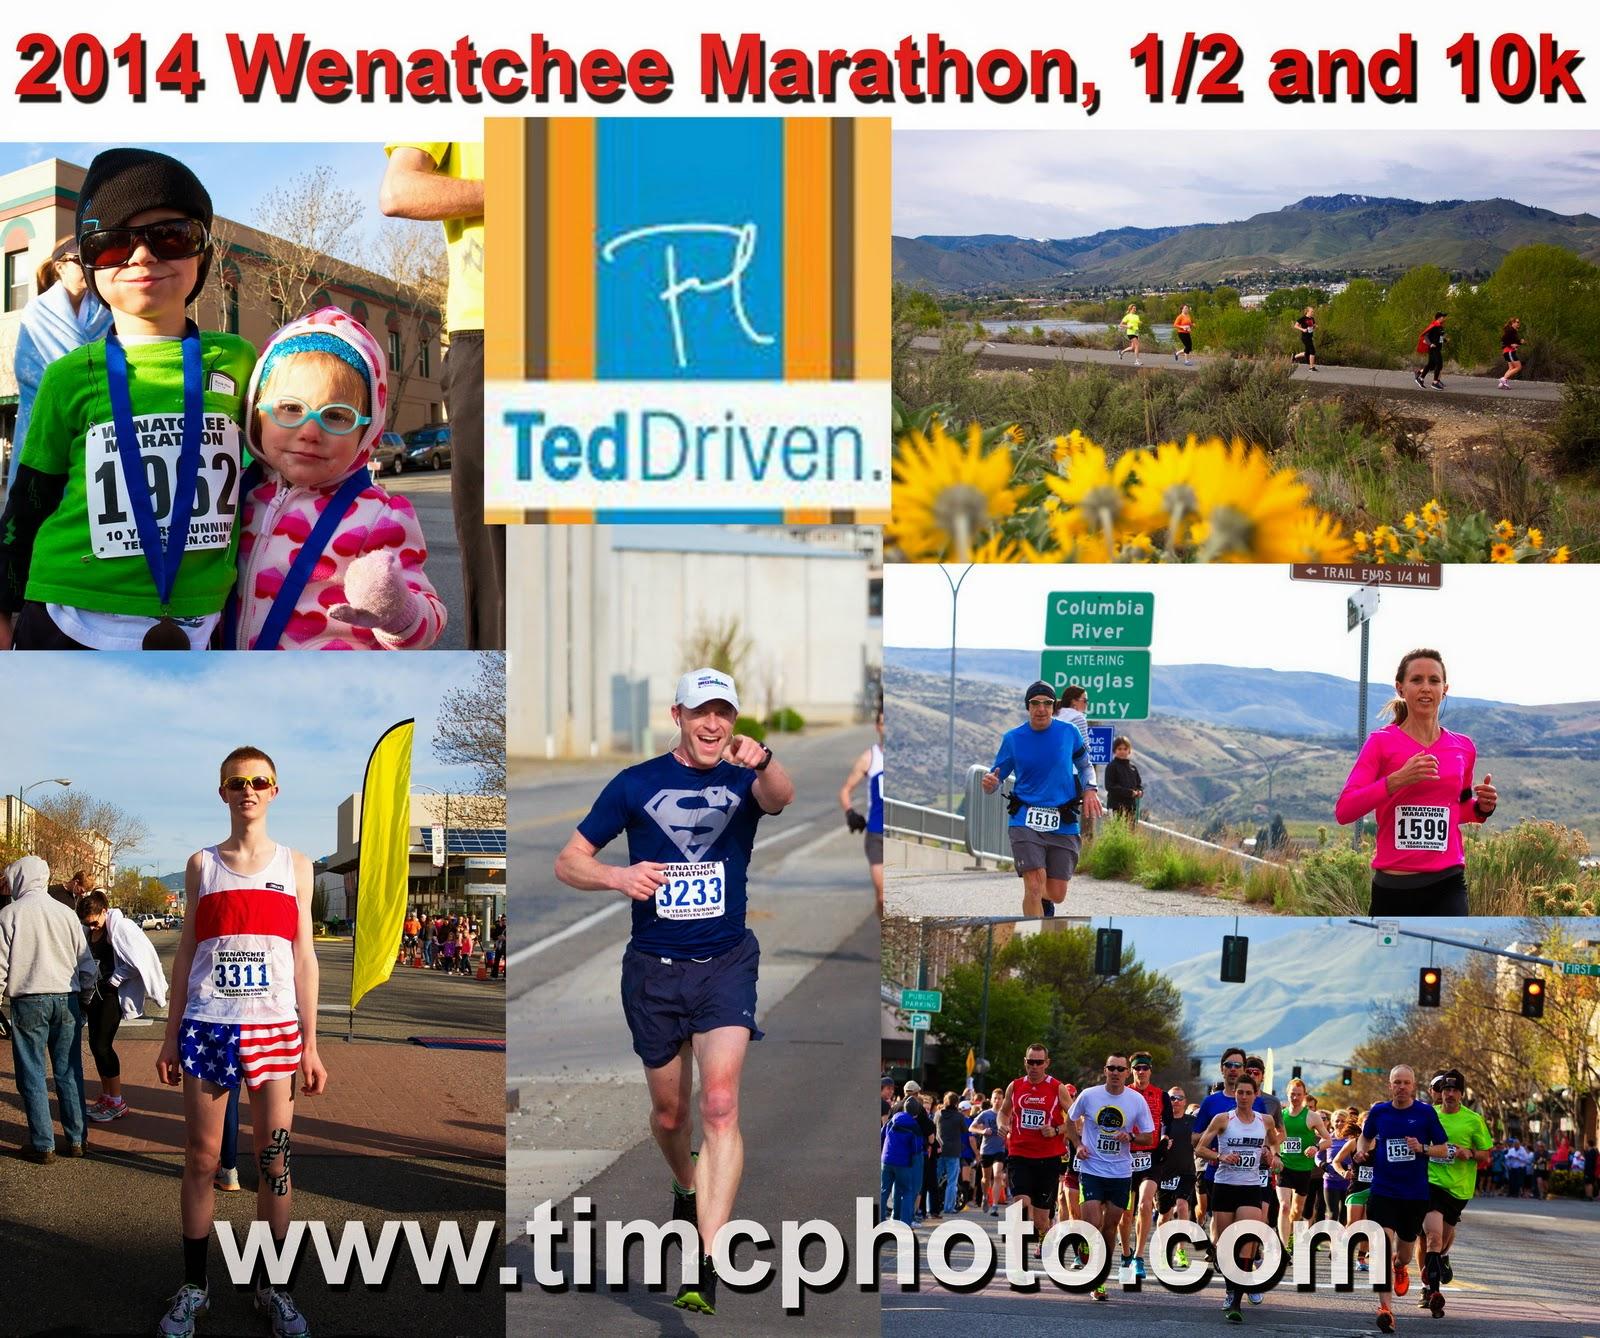 Wenatchee Marathon Photos, marathon, half marathon, 10k, runner, athelete, Central Washington, events, Bellingham, washington, event photographer, action, candid, portrait, photography